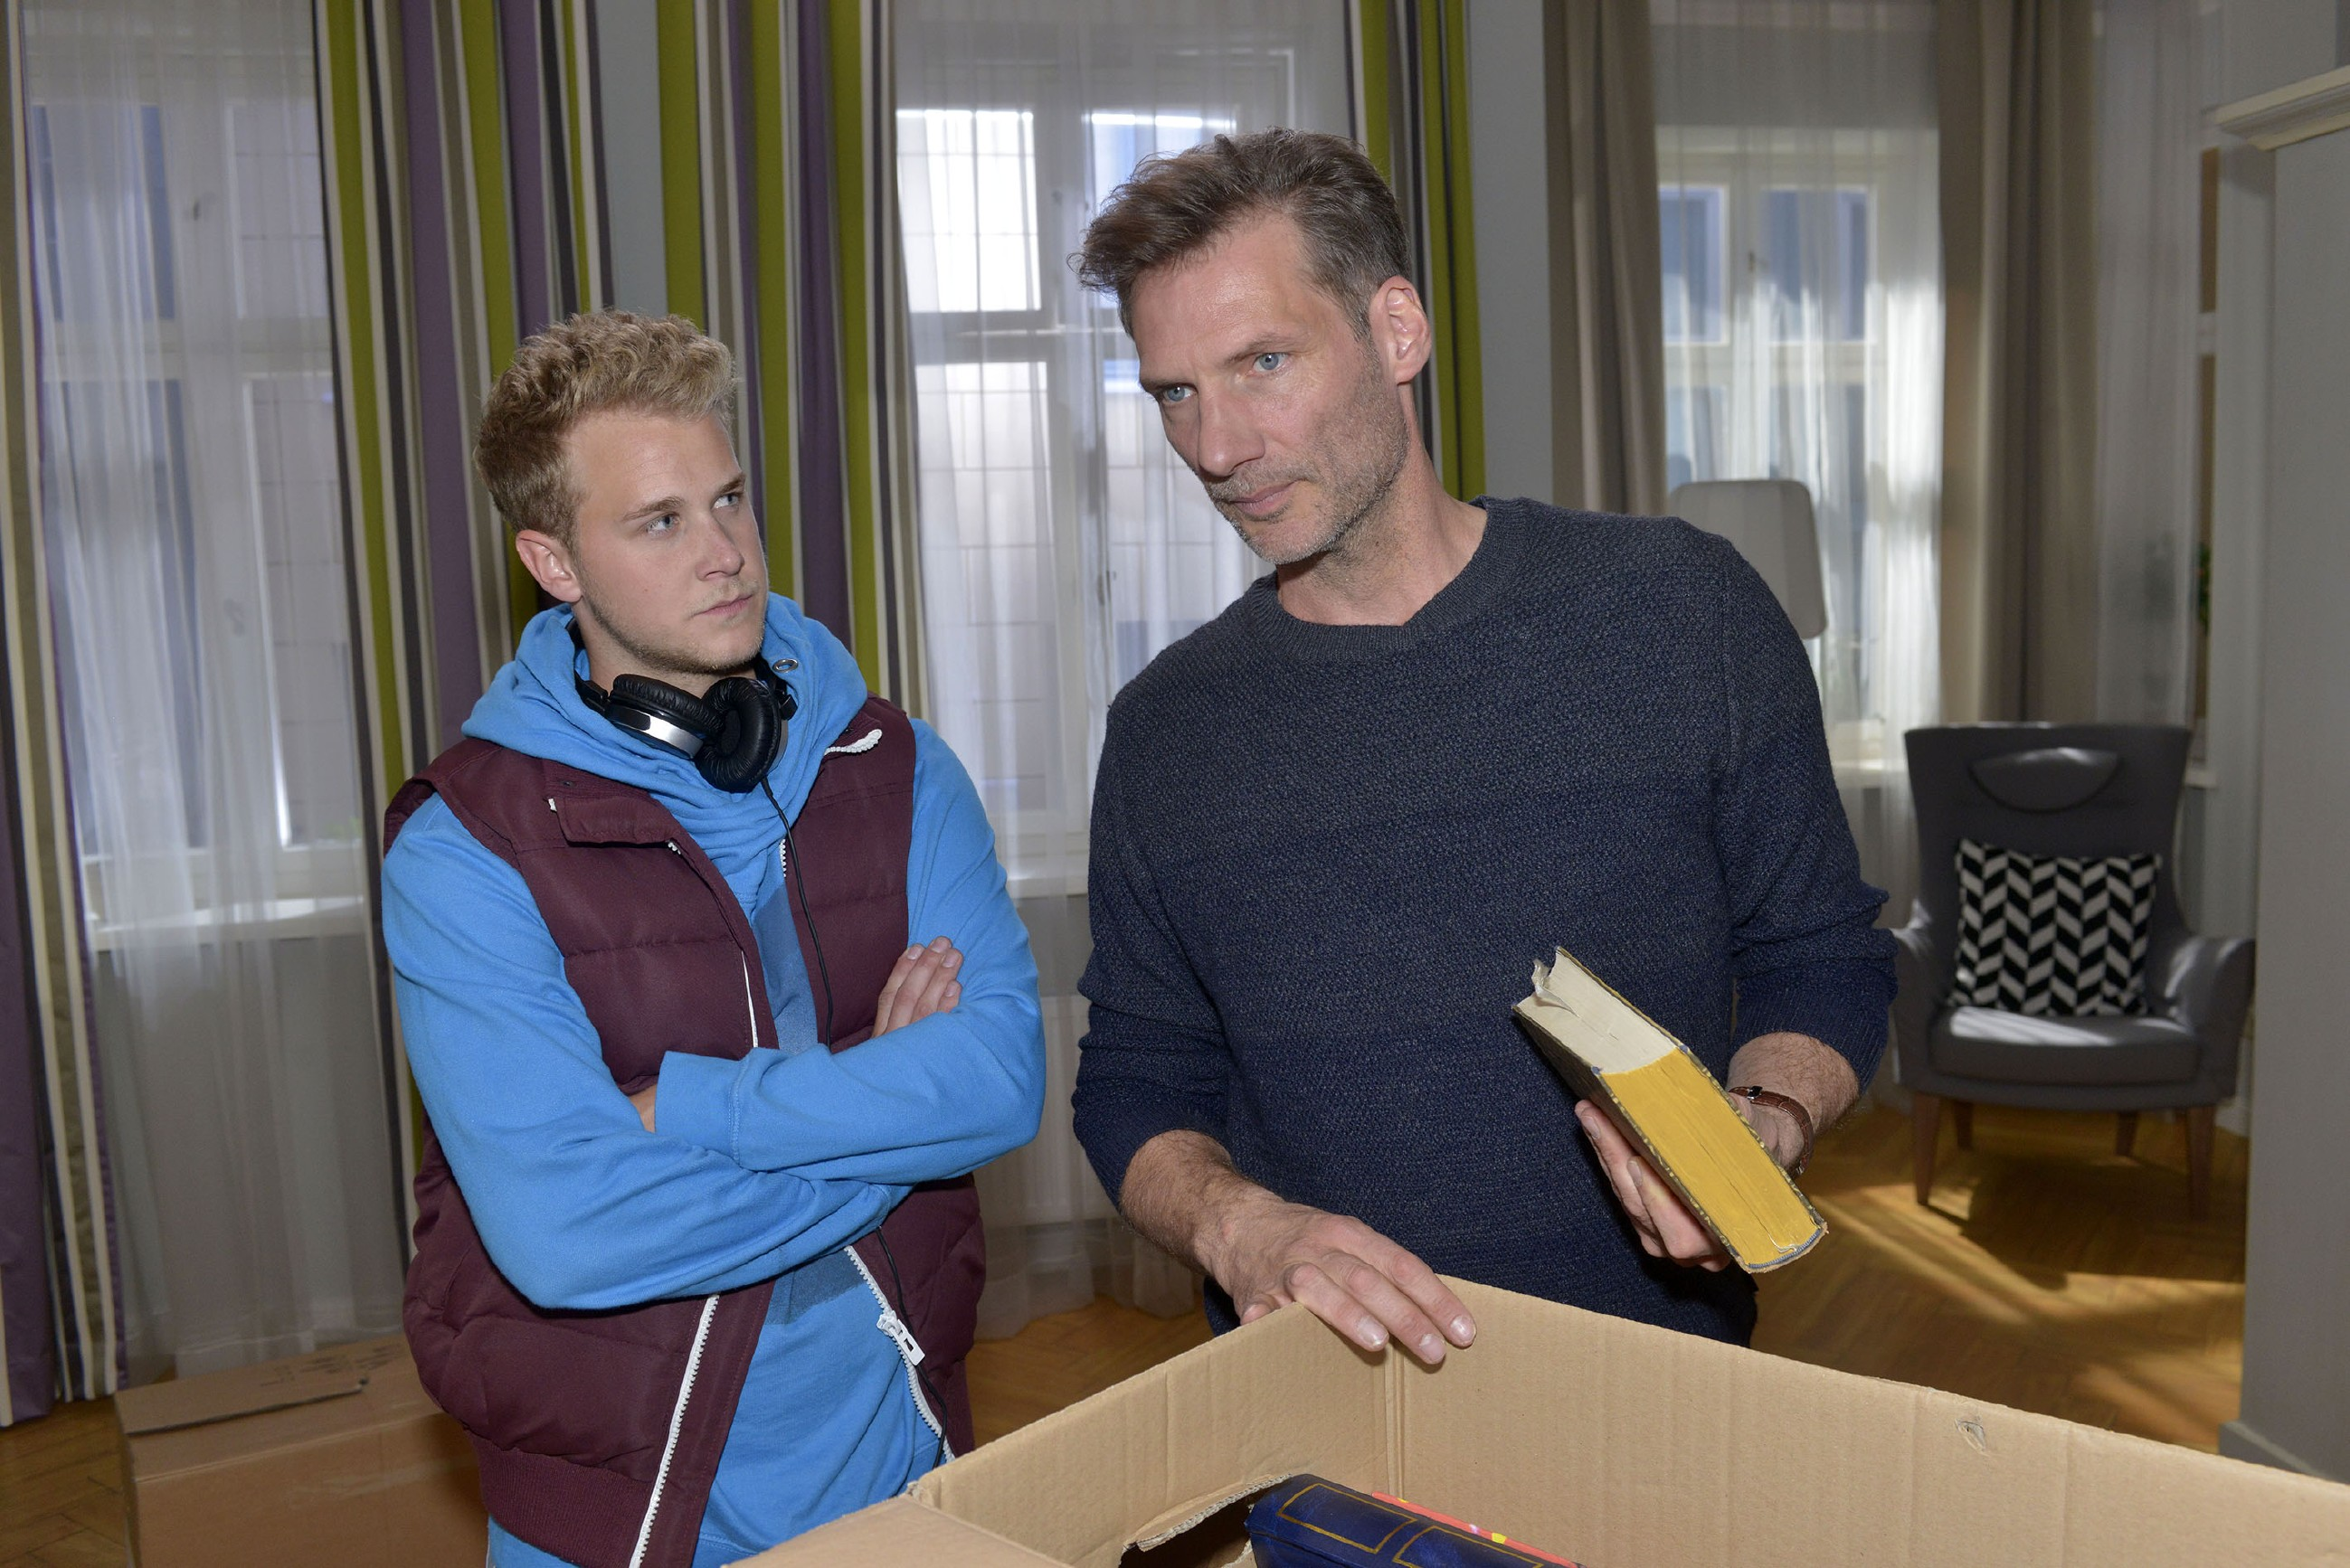 Jonas (Felix van Deventer, l.) spürt, dass Alexander (Clemens Löhr) alten Zeiten nachtrauert. (Quelle: RTL / Rolf Baumgartner)